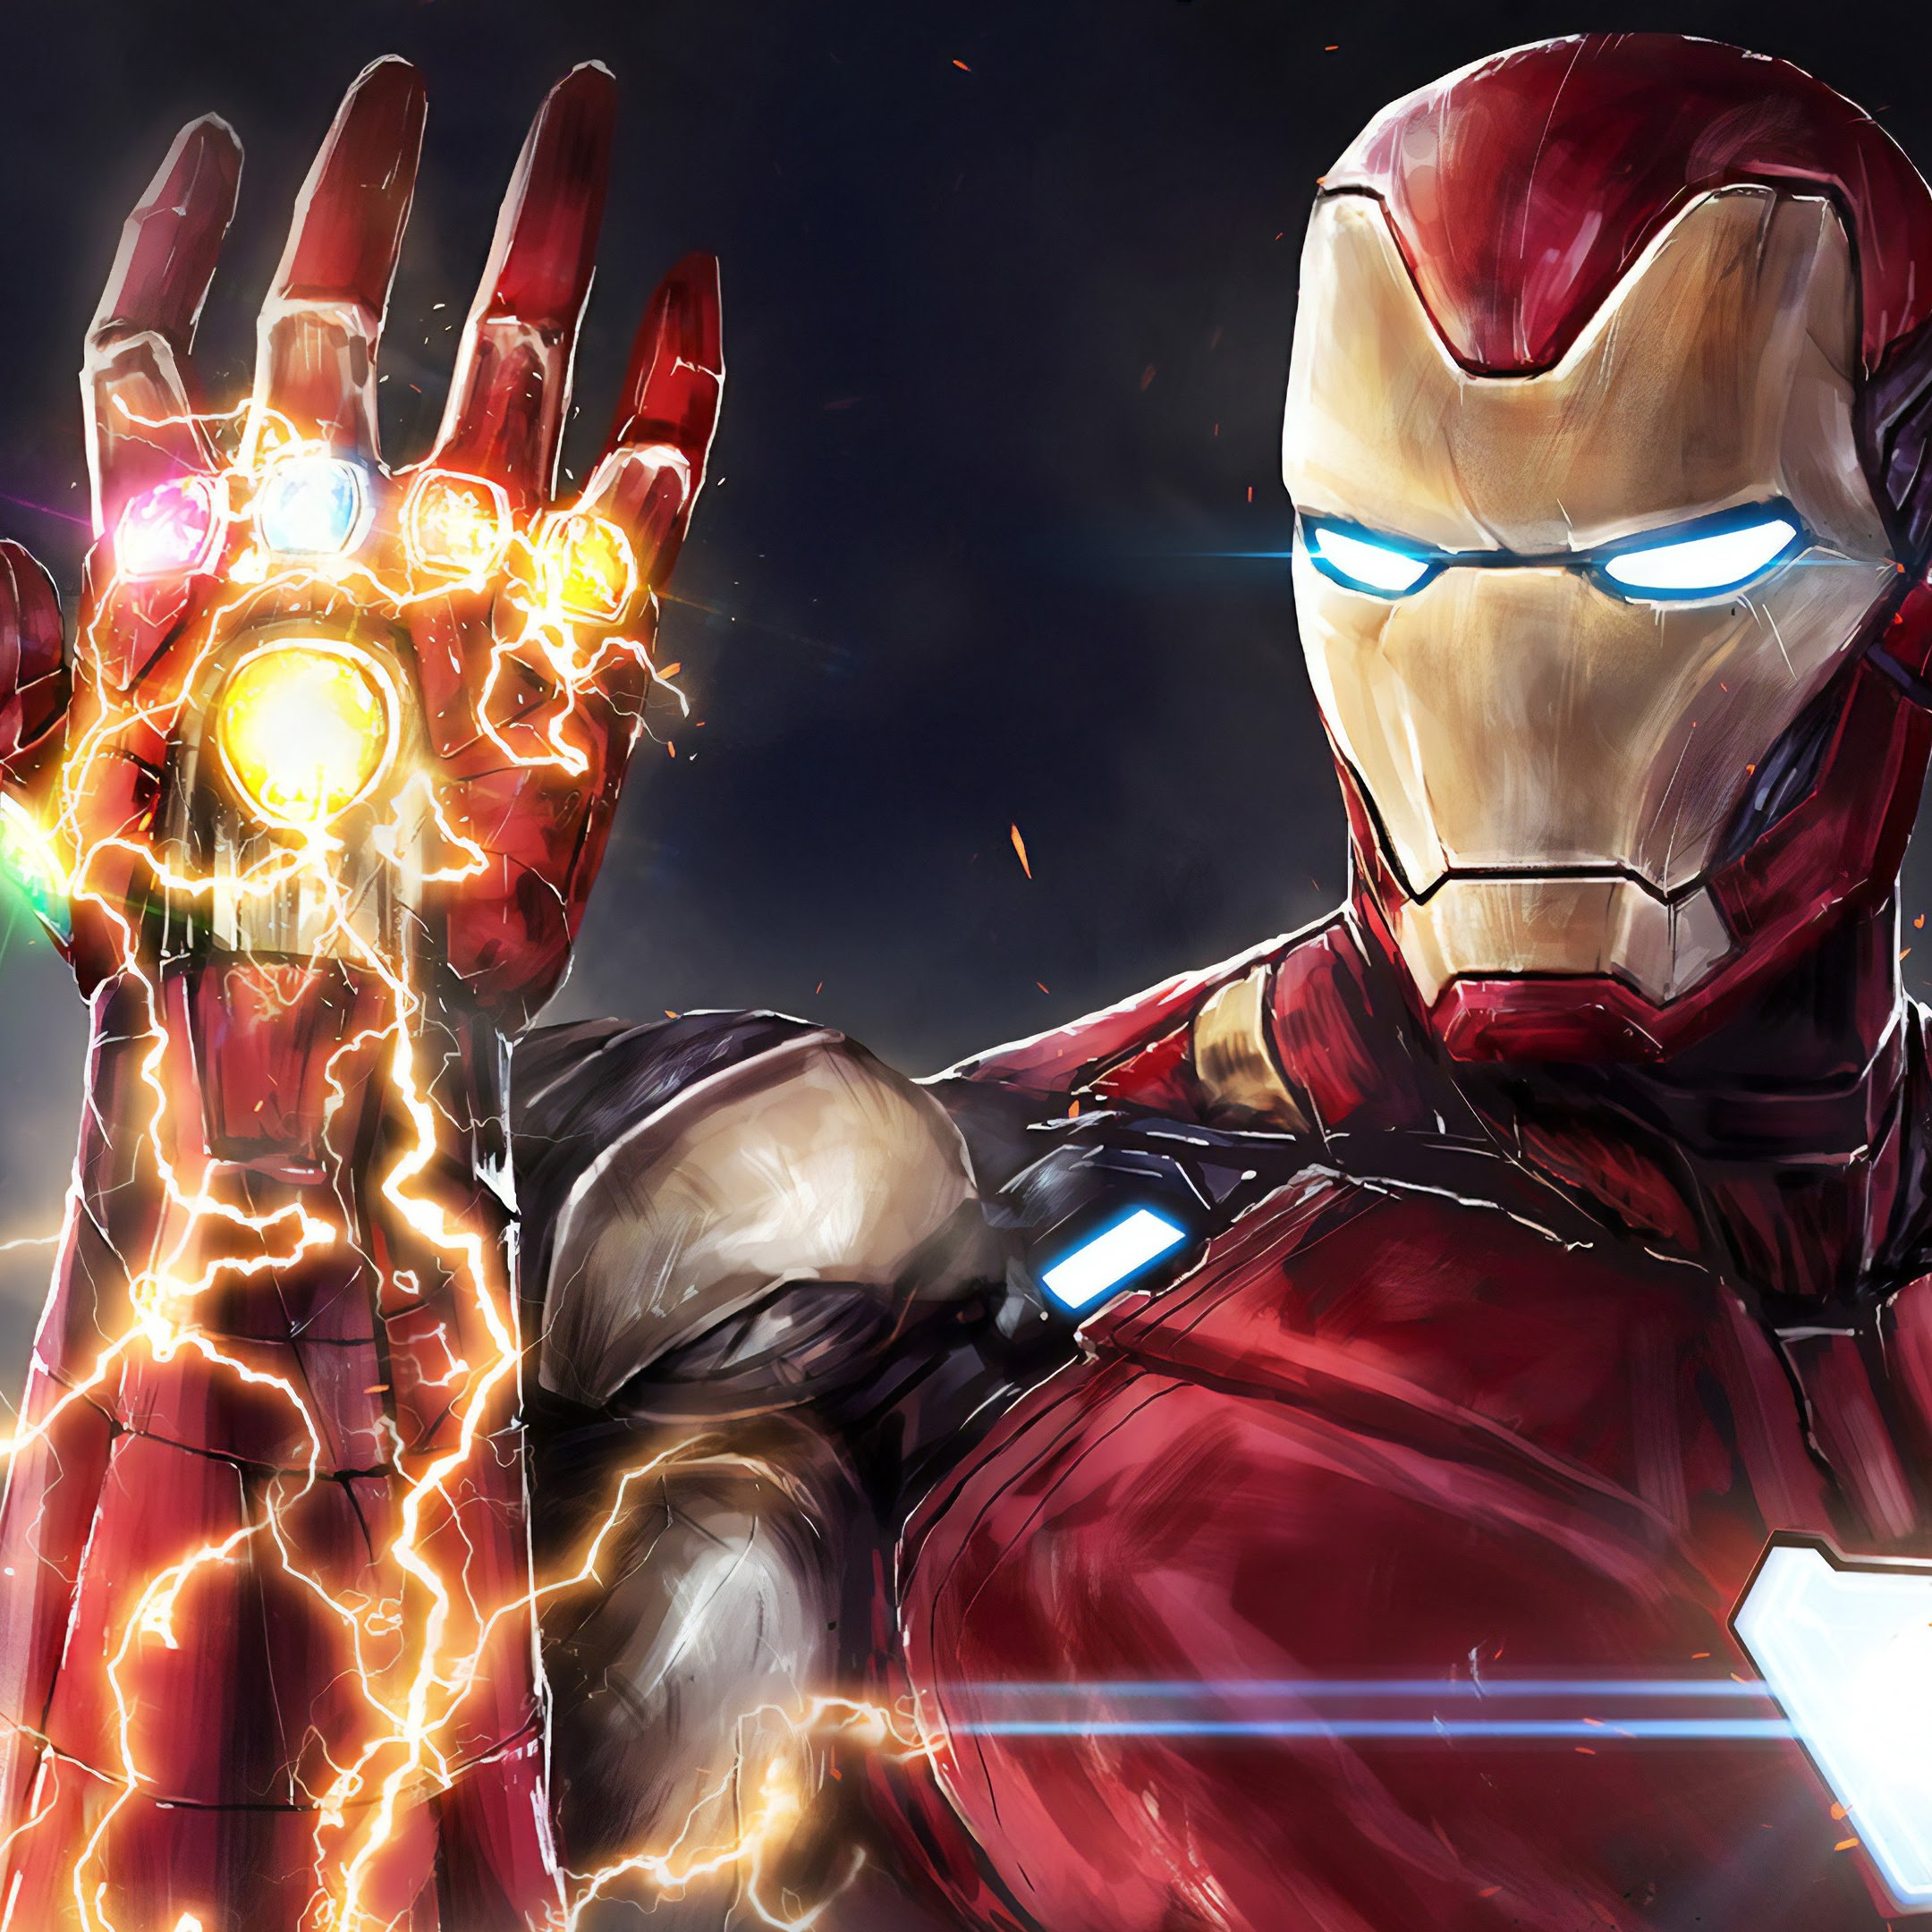 Iron Man Infinity Stones Avengers Endgame 4k 177